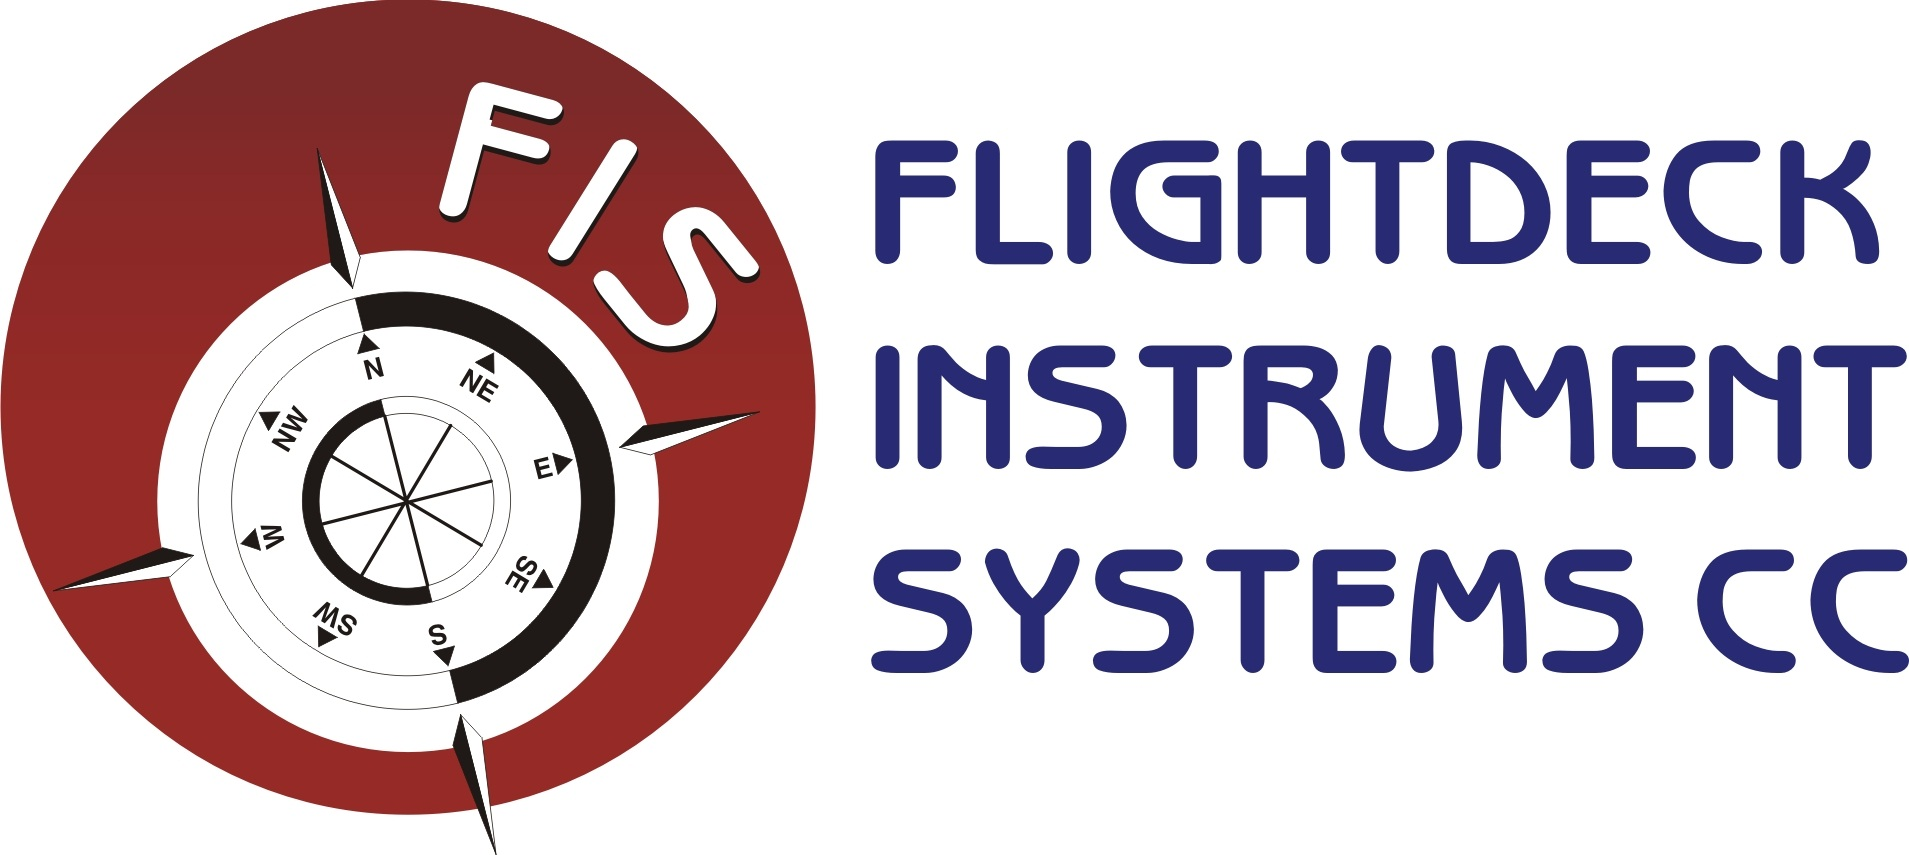 Flightdeck Instrument Systems